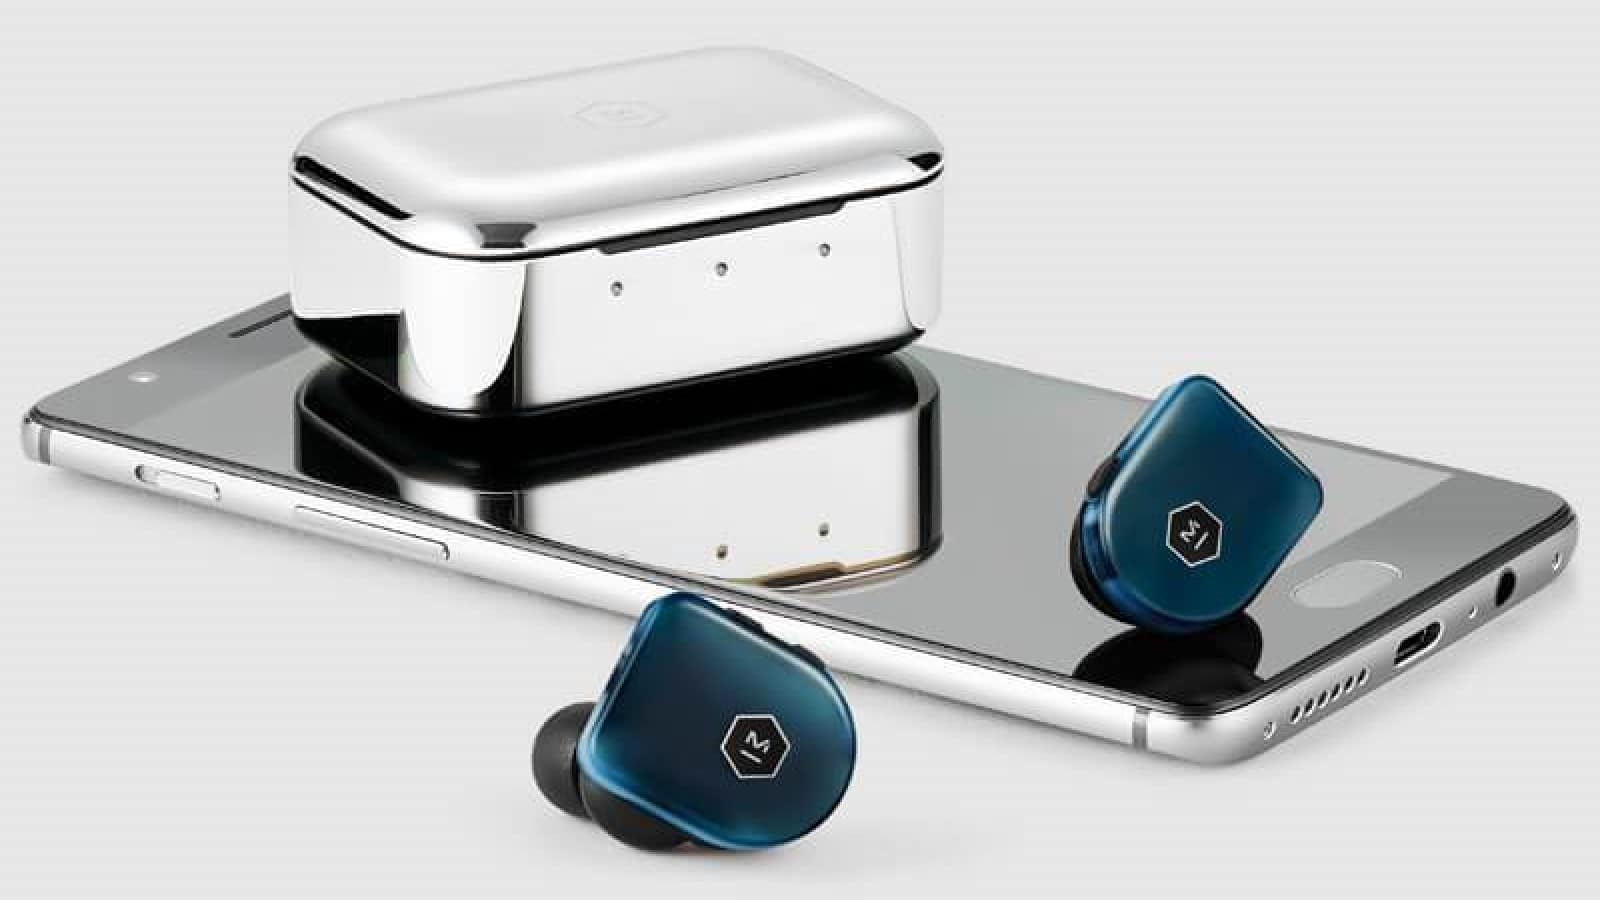 mw07 plus headphones on a smartphone